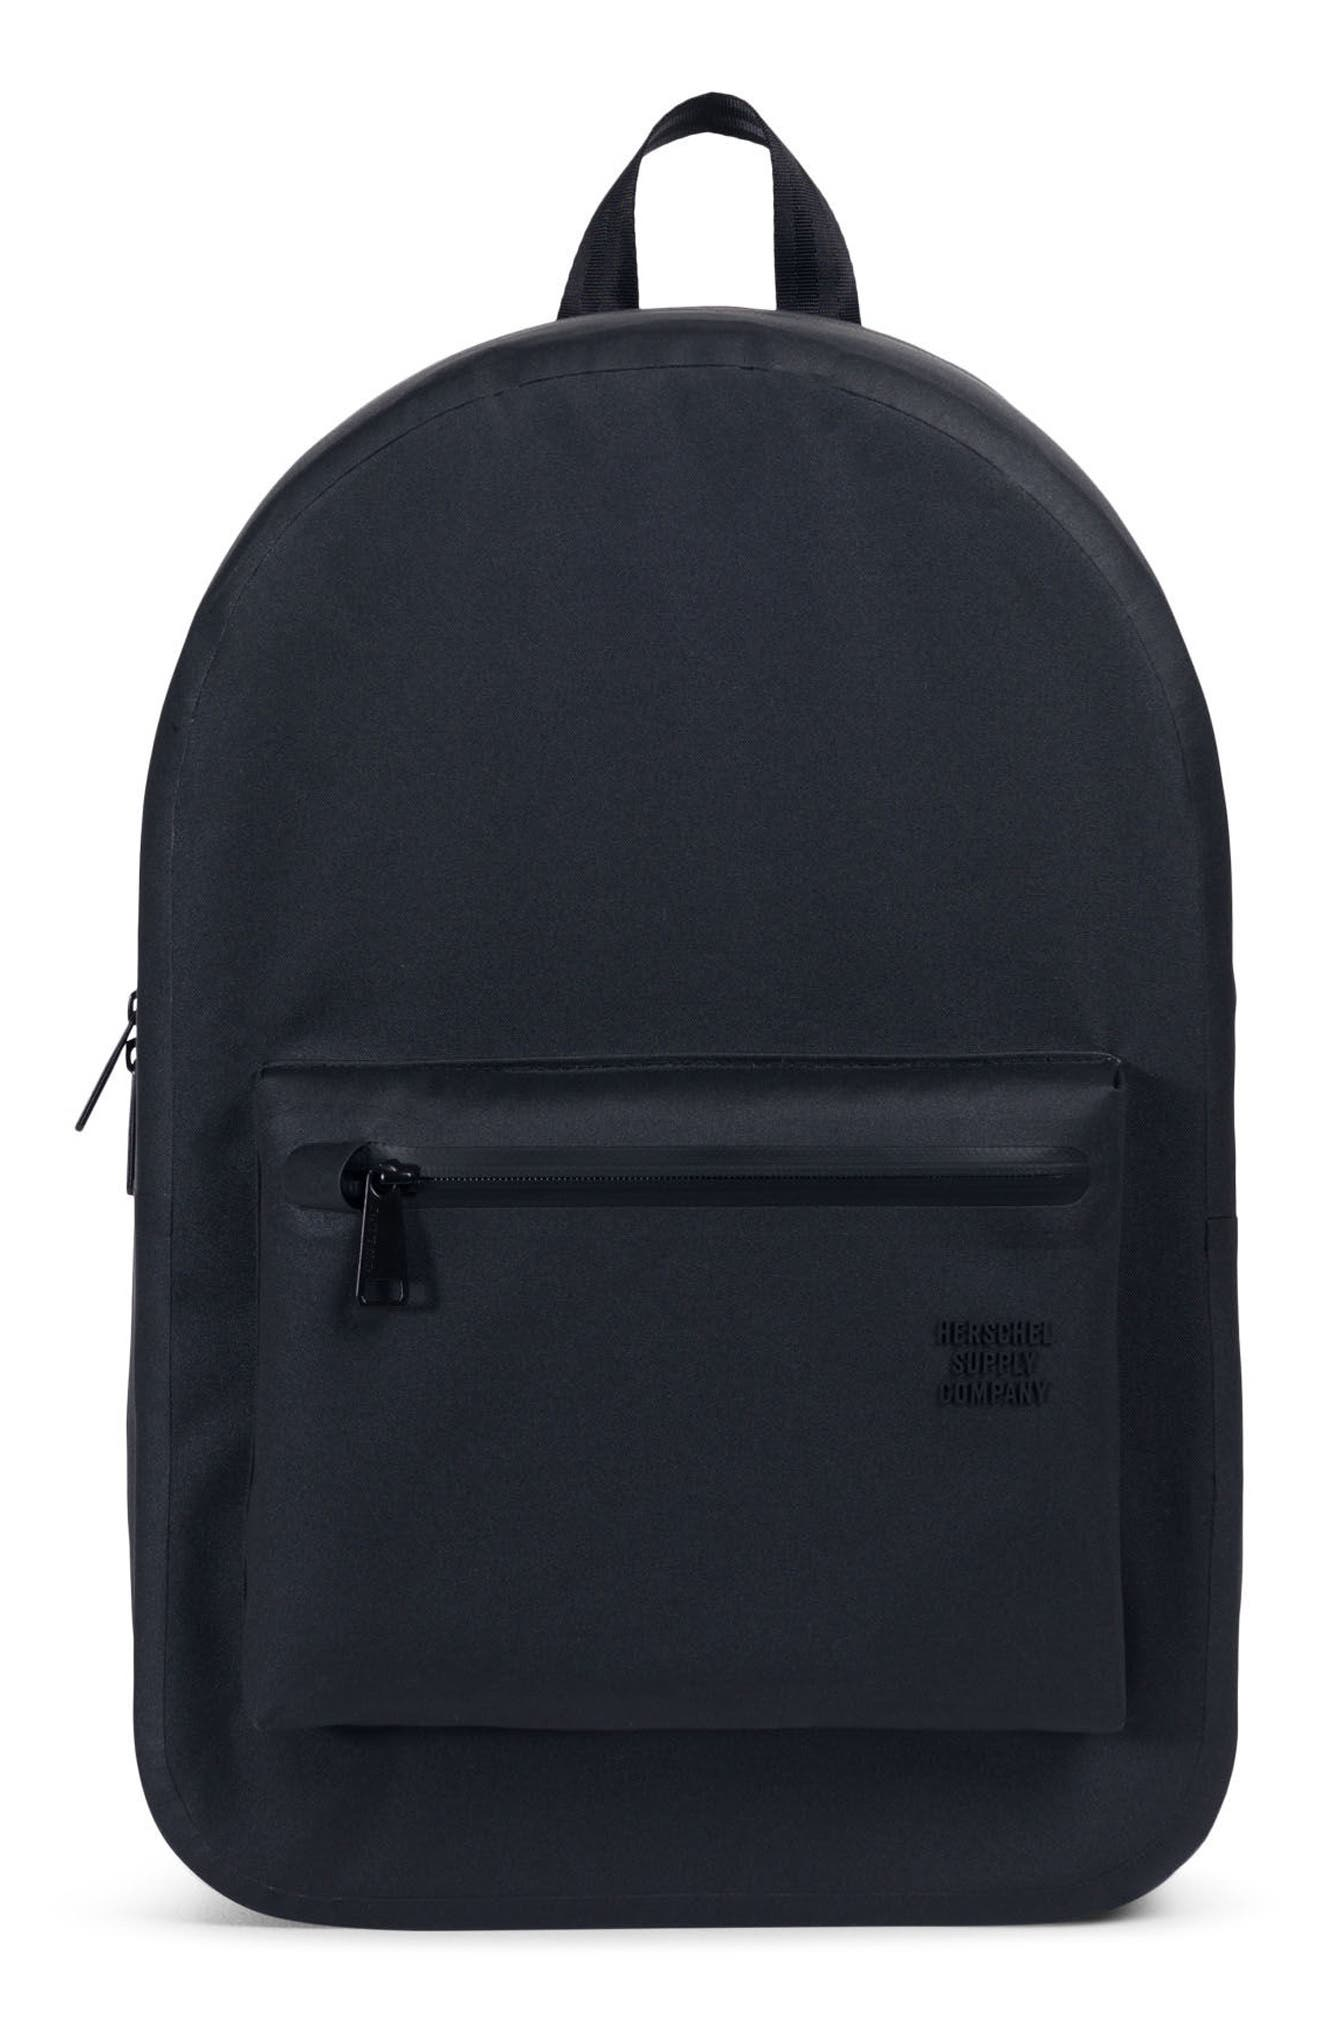 Settlement Studio Backpack,                         Main,                         color, BLACK